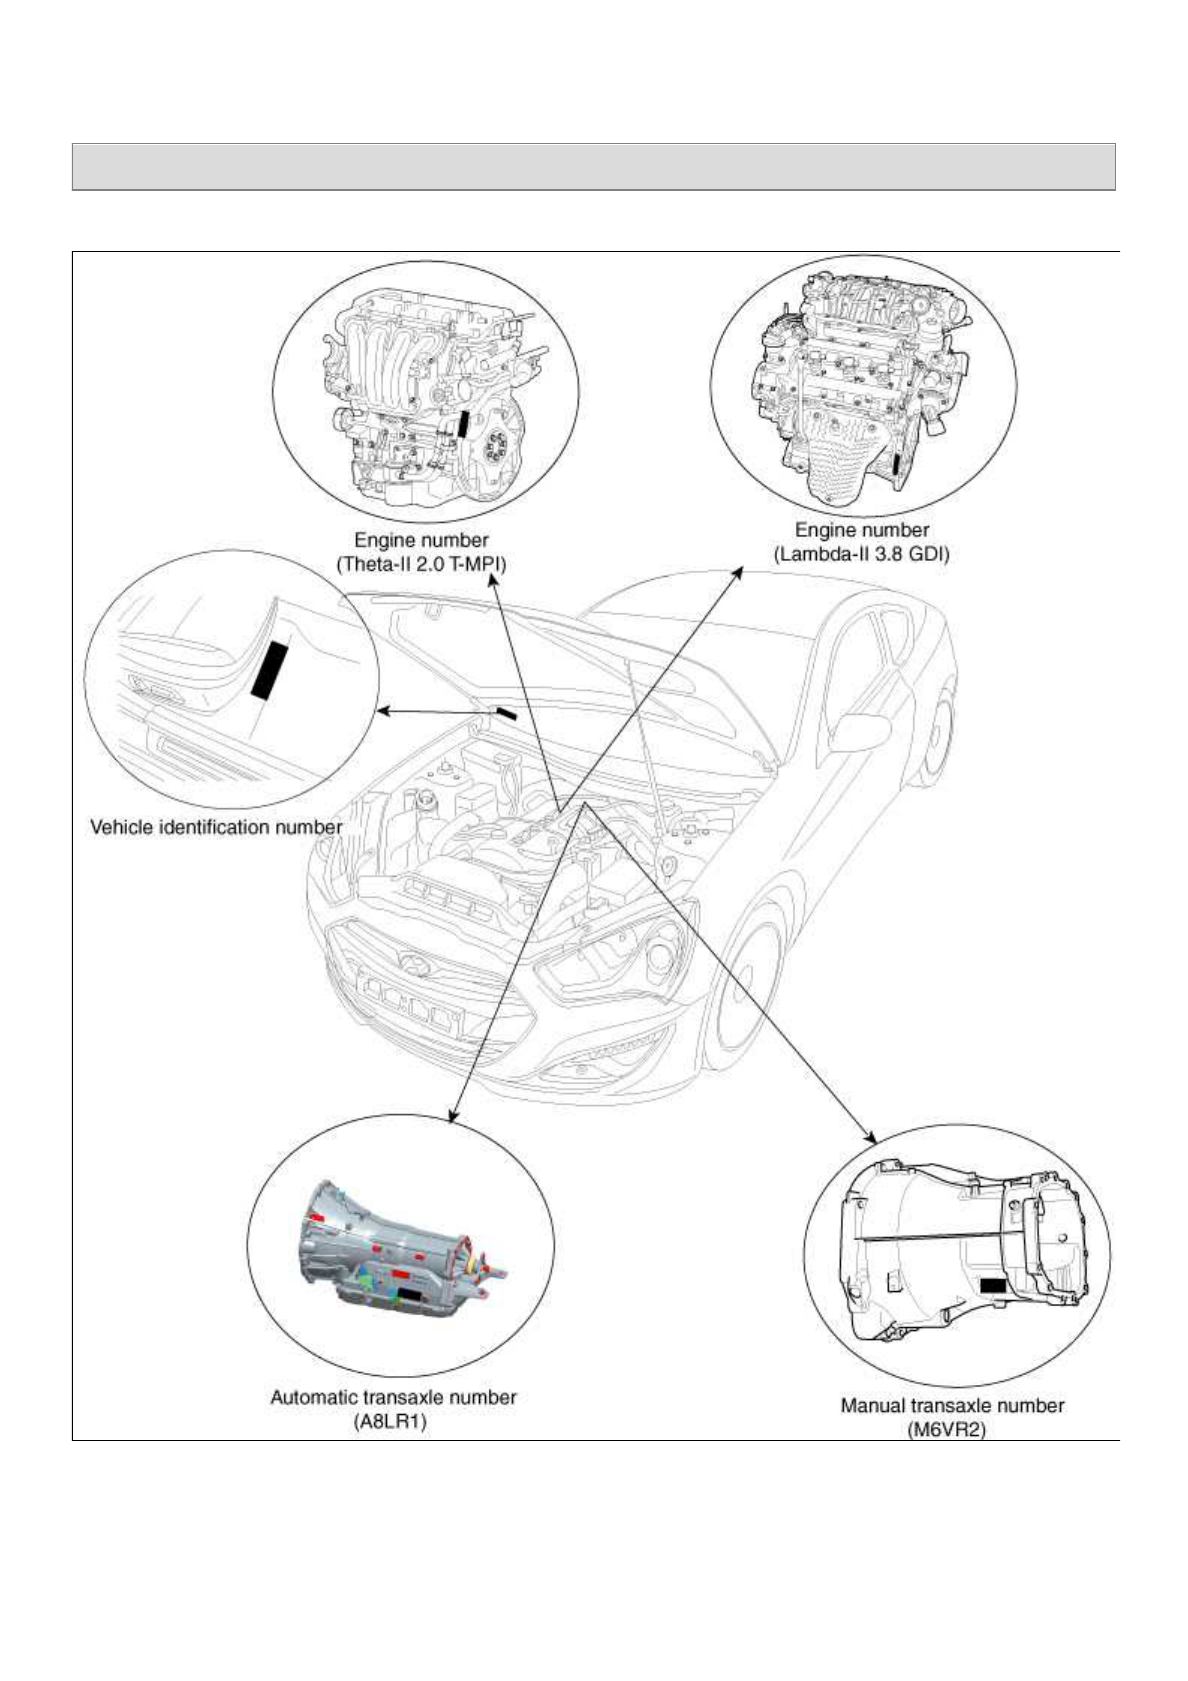 Hyundai 2 0 Engine Diagram - Classic Car Wiring Diagrams -  bobcate-s70.kdx-200.jeanjaures37.fr | Hyundai 2 0 Engine Diagram |  | Wiring Diagram Resource